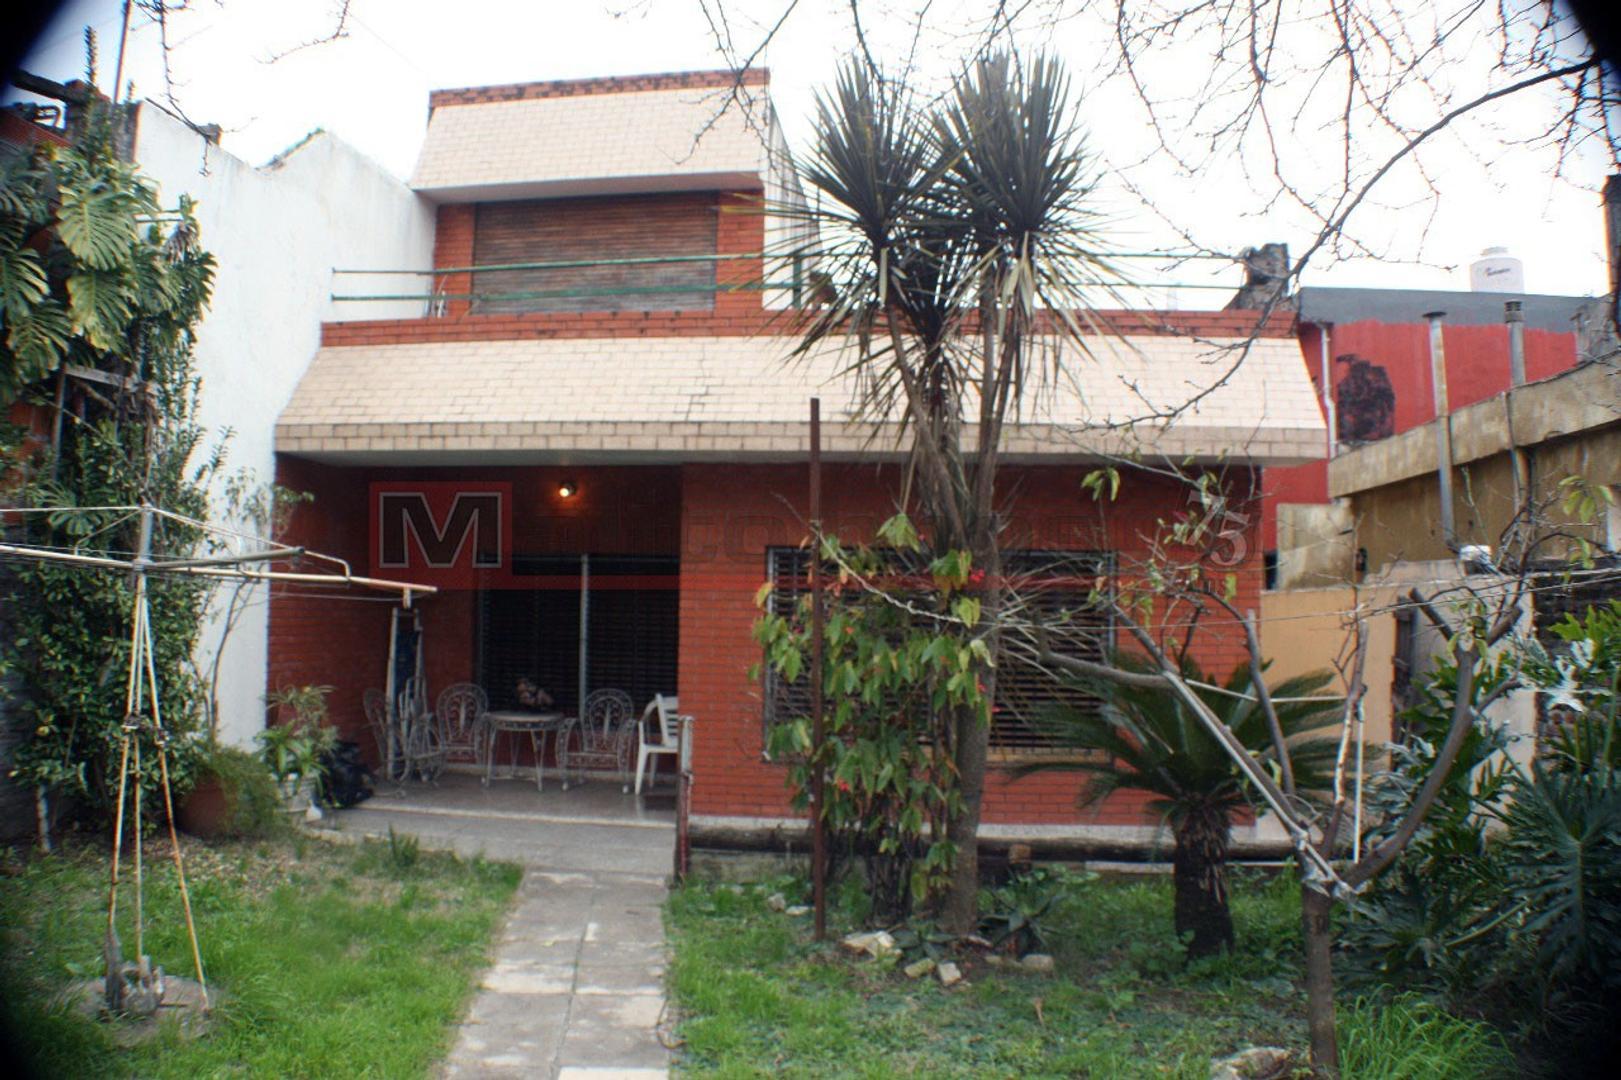 Casa en alquiler en dr j i de la roza 5900 villa lugano for Casa de muebles capital federal